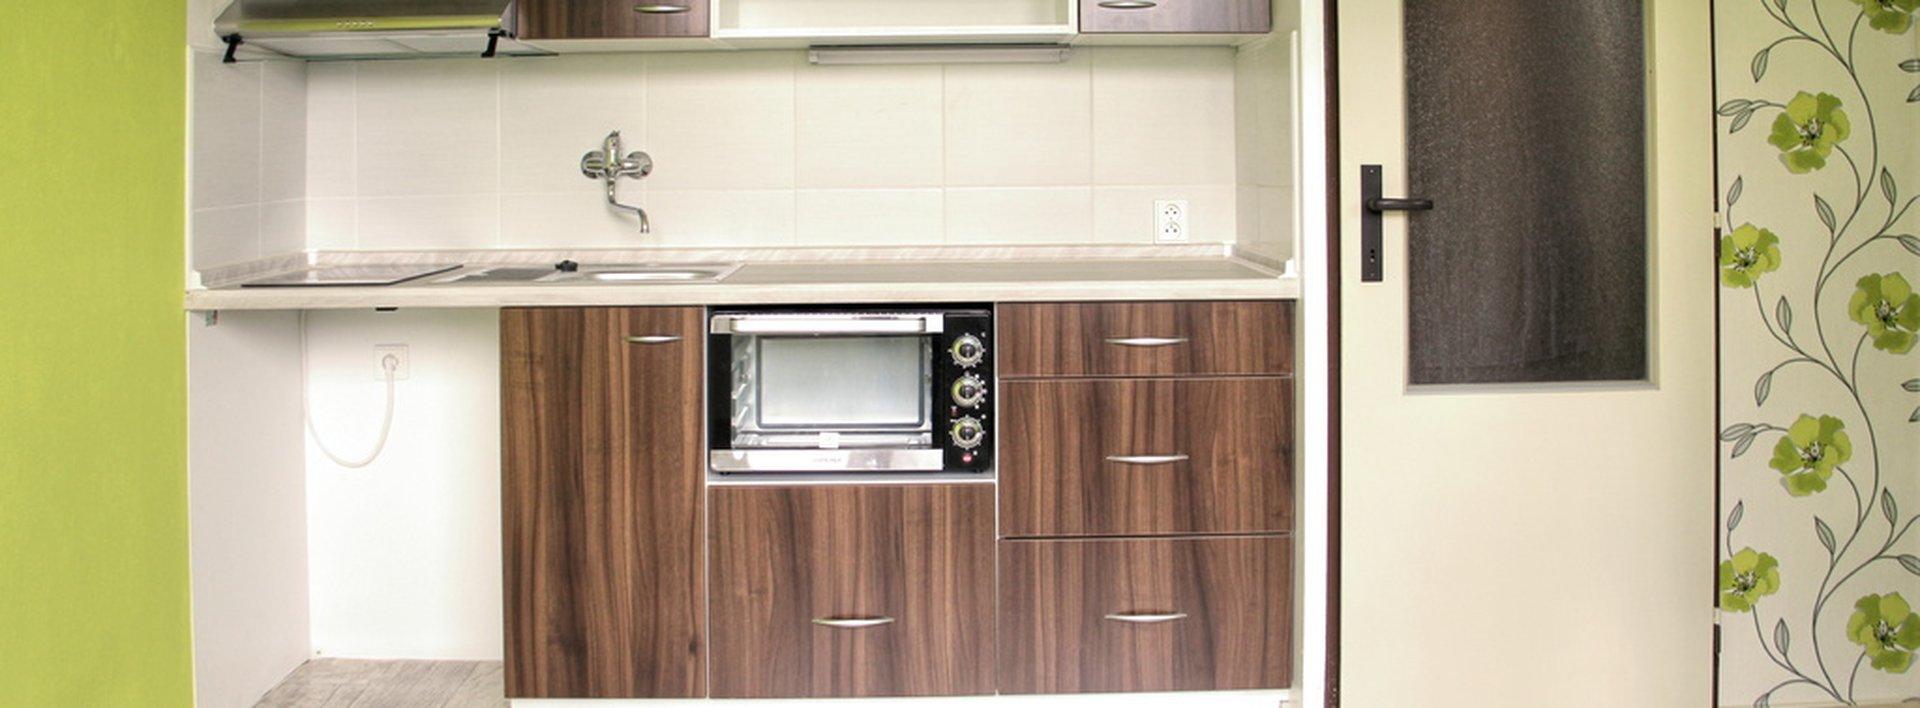 Pronájem bytu 1+1, 36 m², Ev.č.: N47321